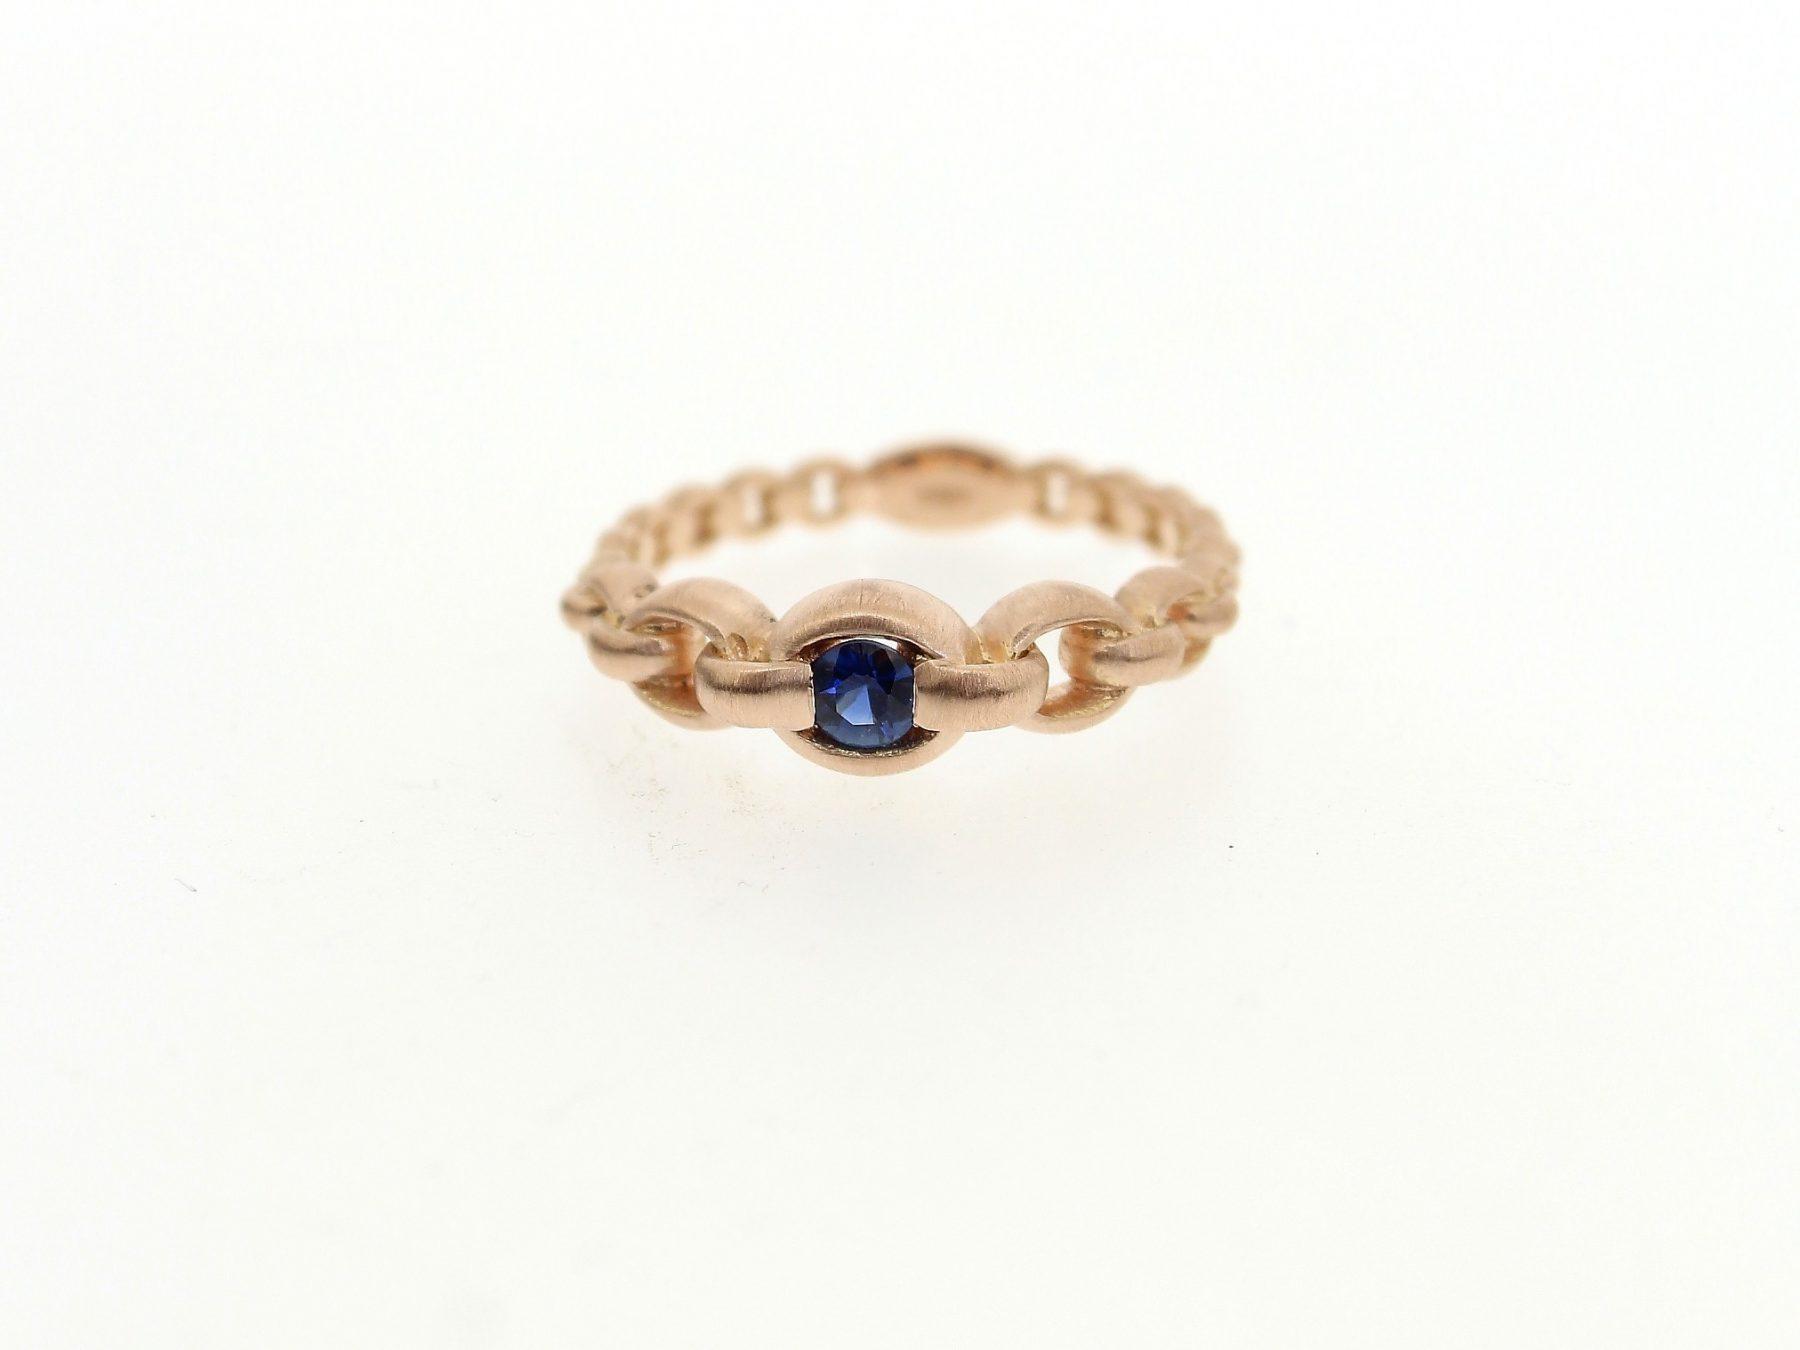 Ring Saphir 18ct Roségold - GalerieVoigt - AN29217